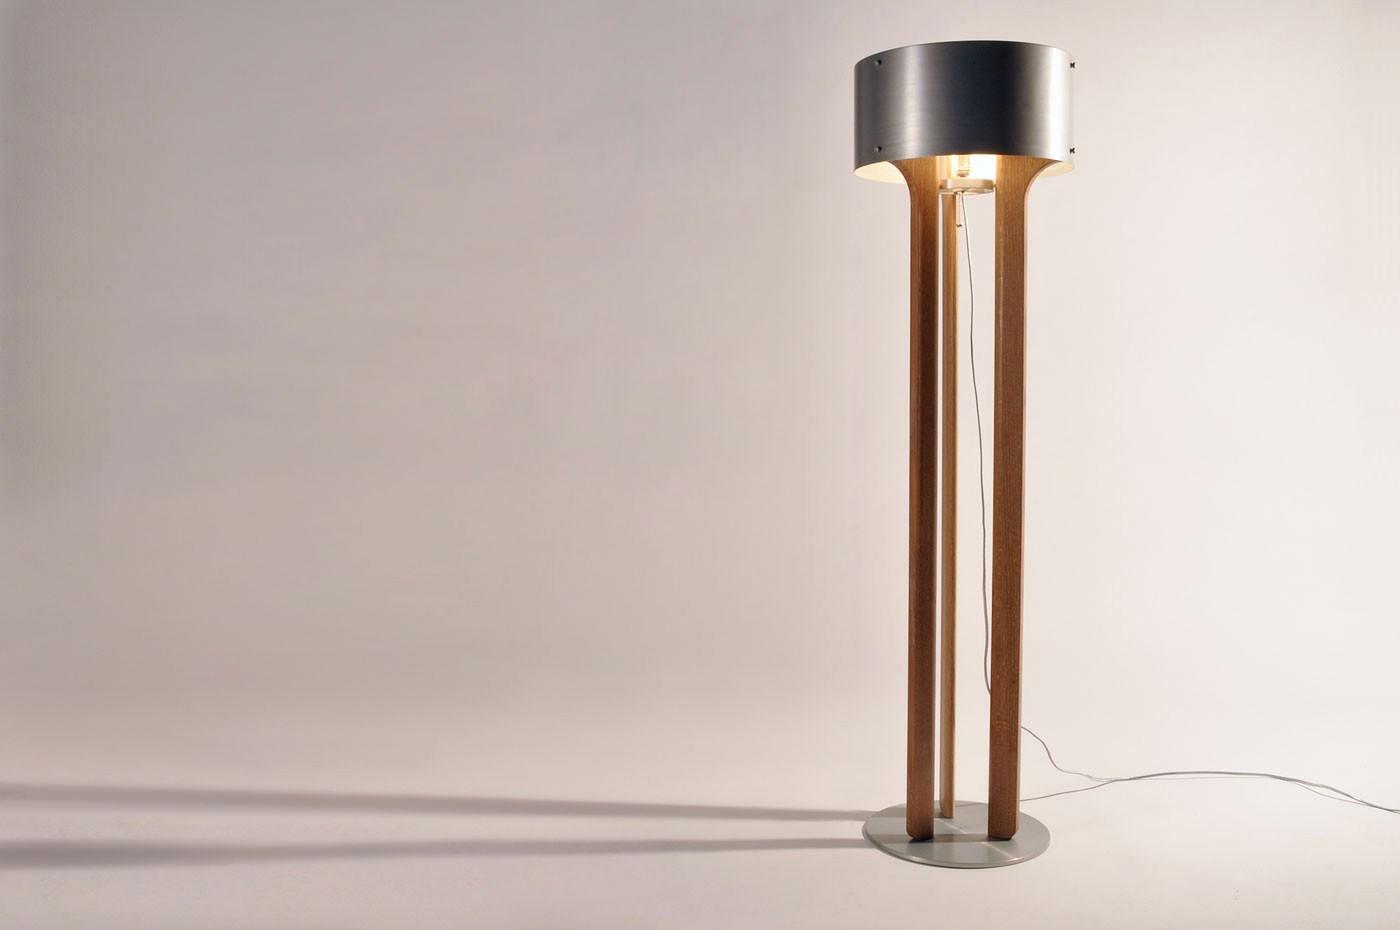 Matthew Fairbank - Pommer Floor Lamp